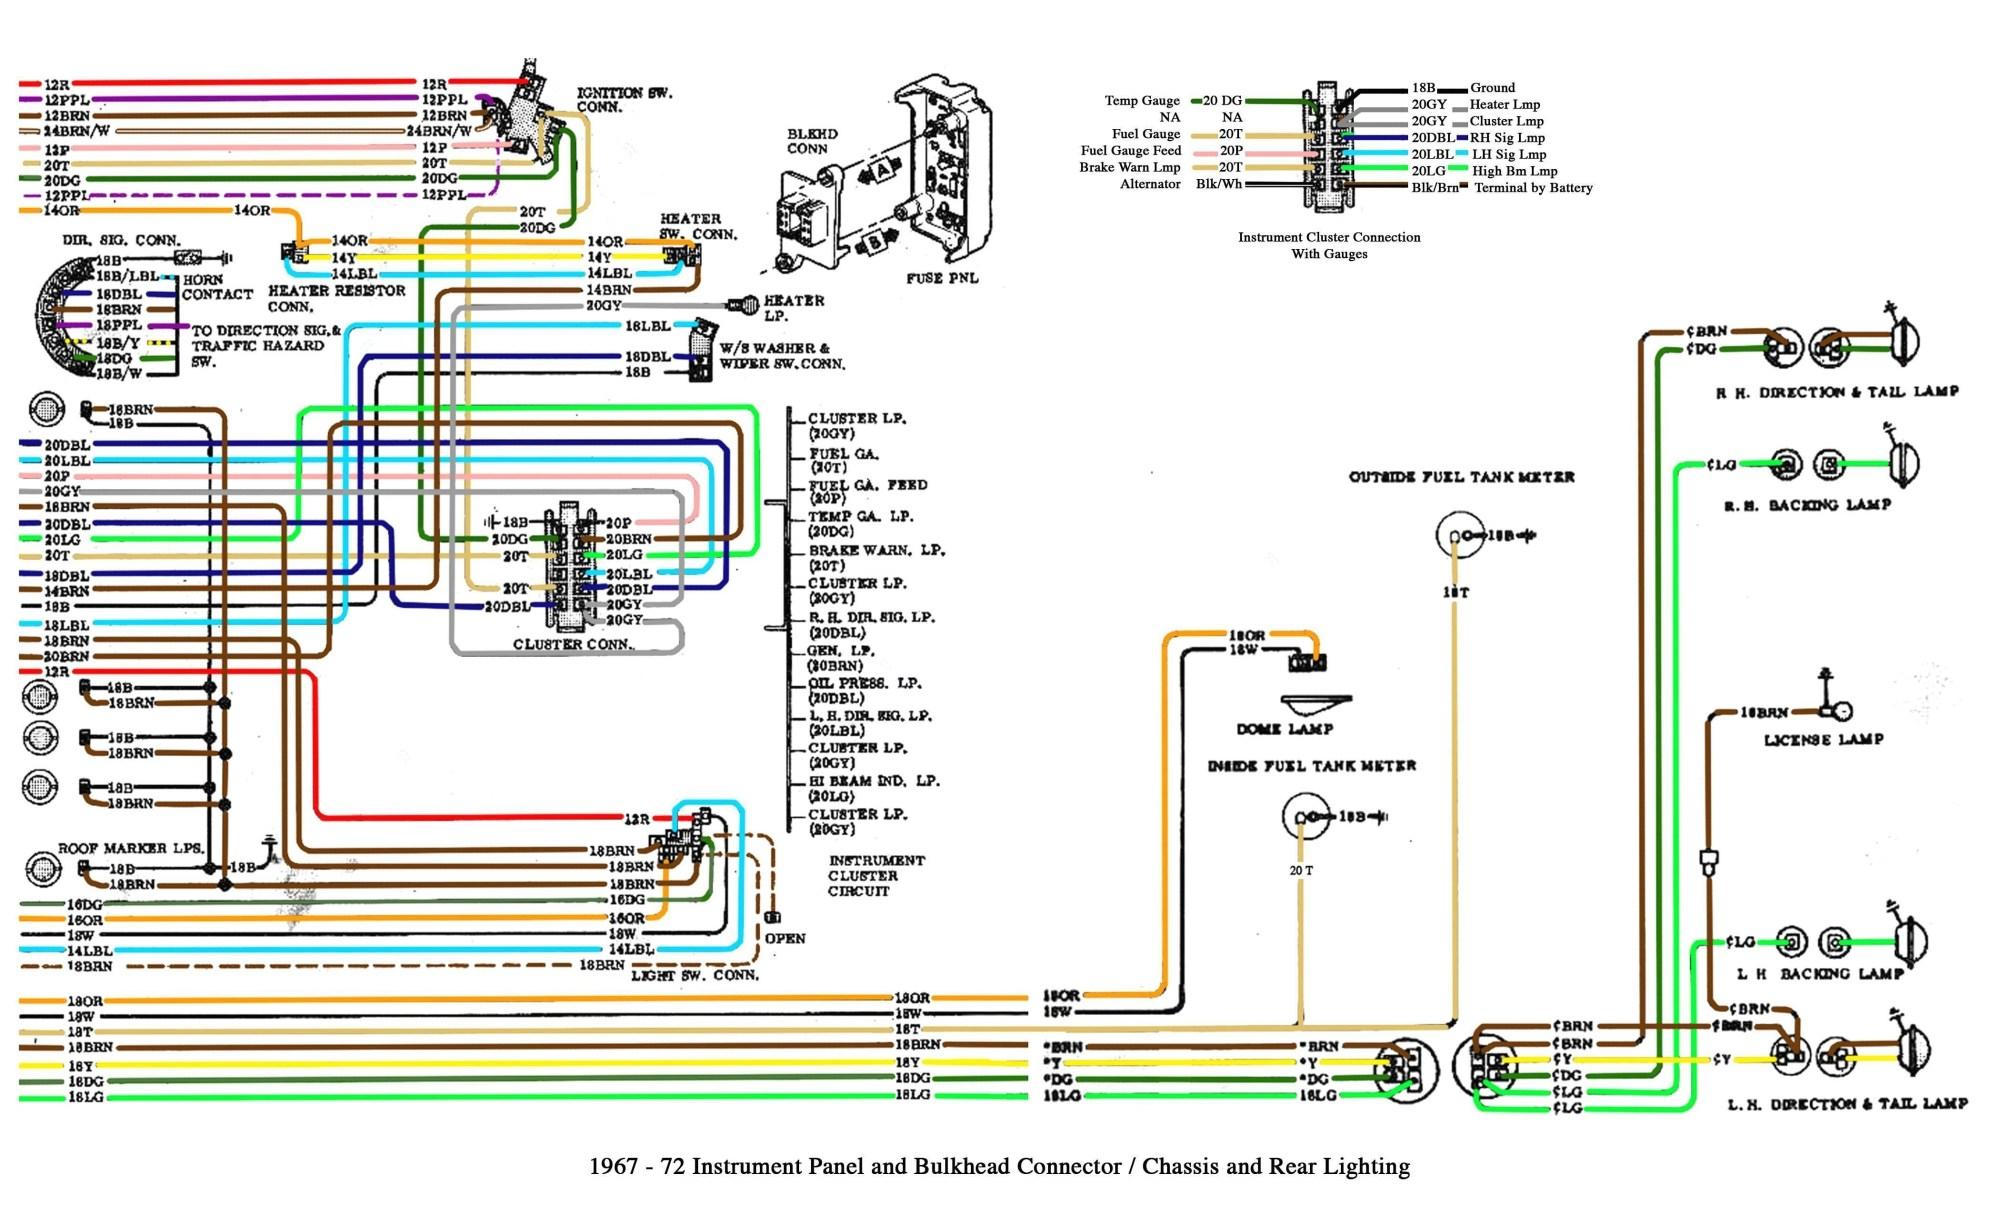 hight resolution of 1990 chevy silverado radio wiring diagram 1989 chevy 1500 radio wiring wire center u2022 rh